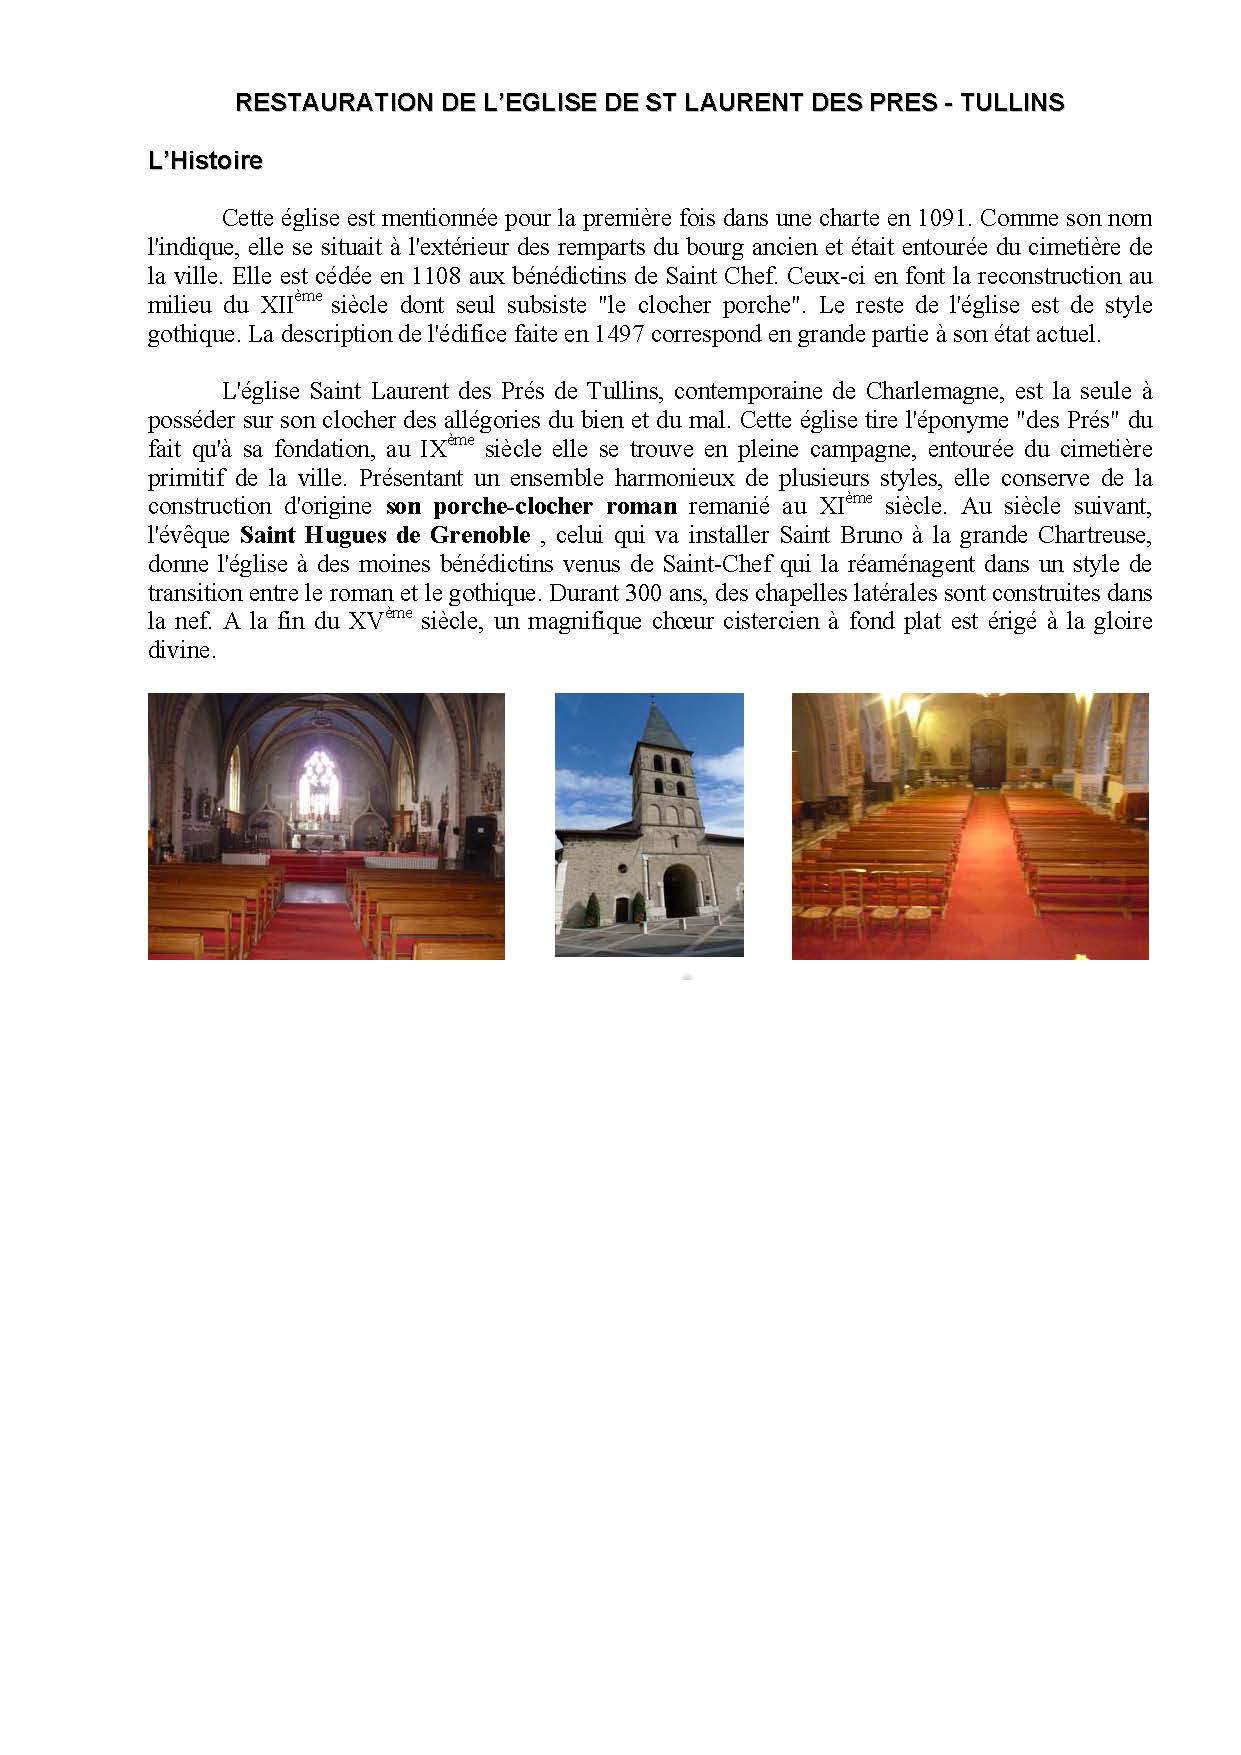 Invita-restauration-église-12-04-13